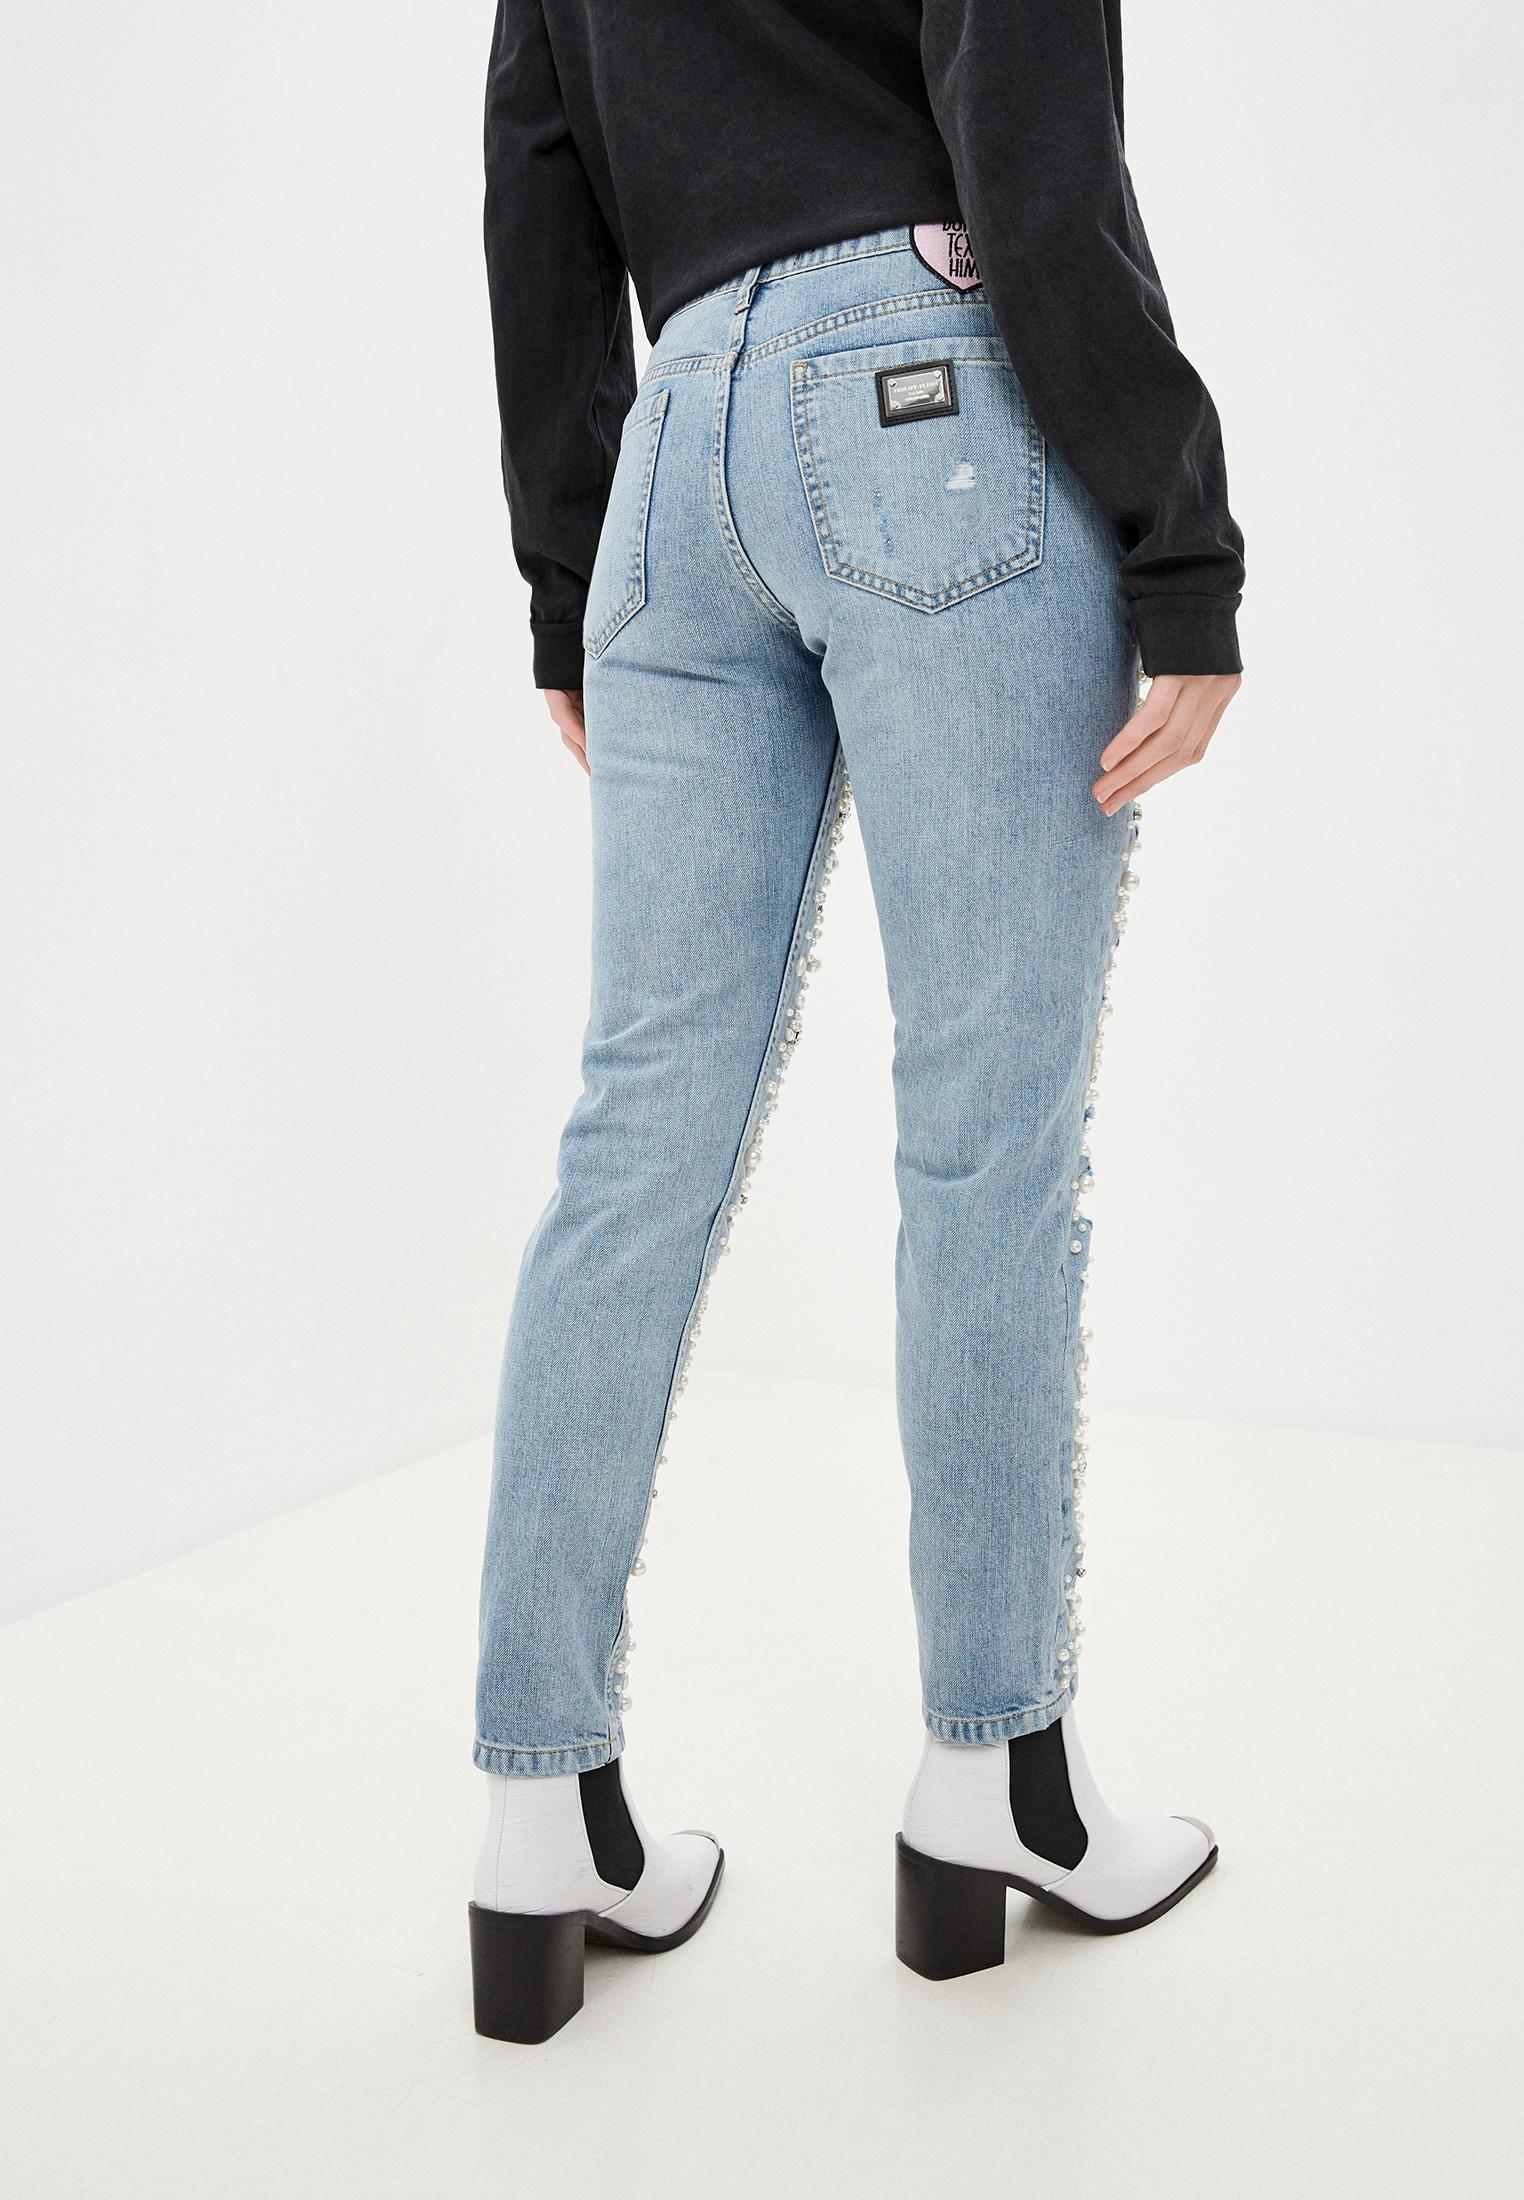 Зауженные джинсы Philipp Plein A17C WDT0462 PDE004N: изображение 4